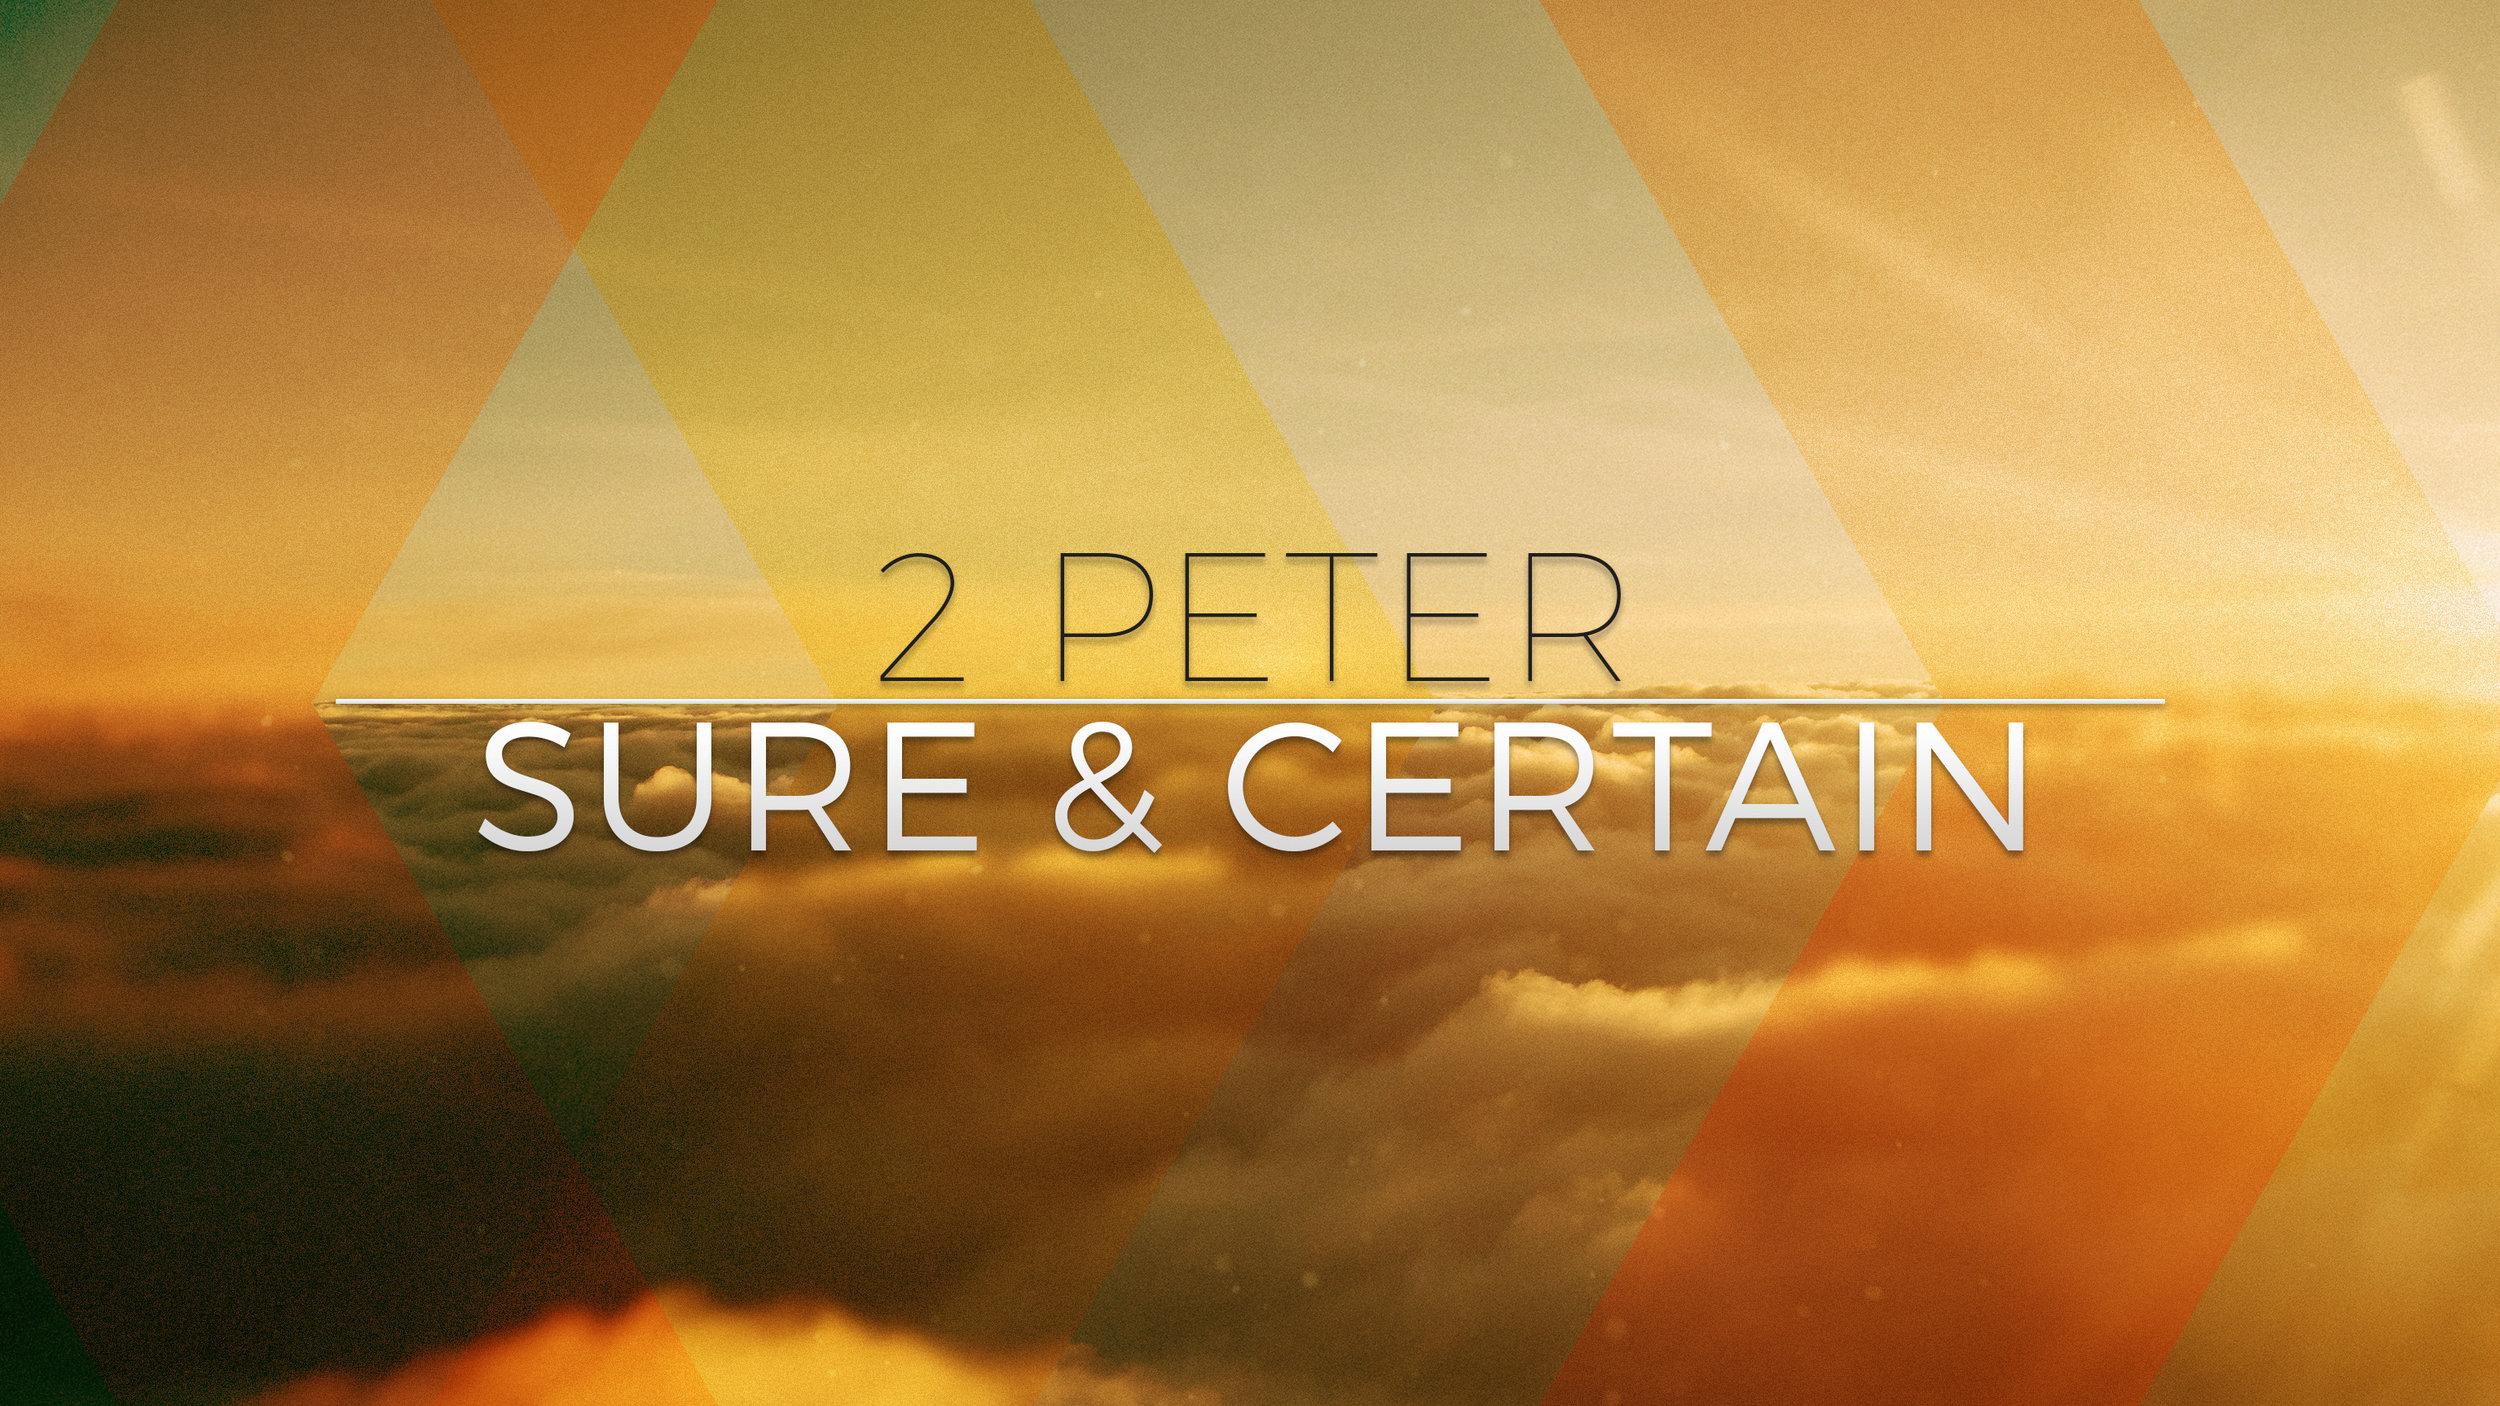 2 Peter _ Sure & Certain.jpg